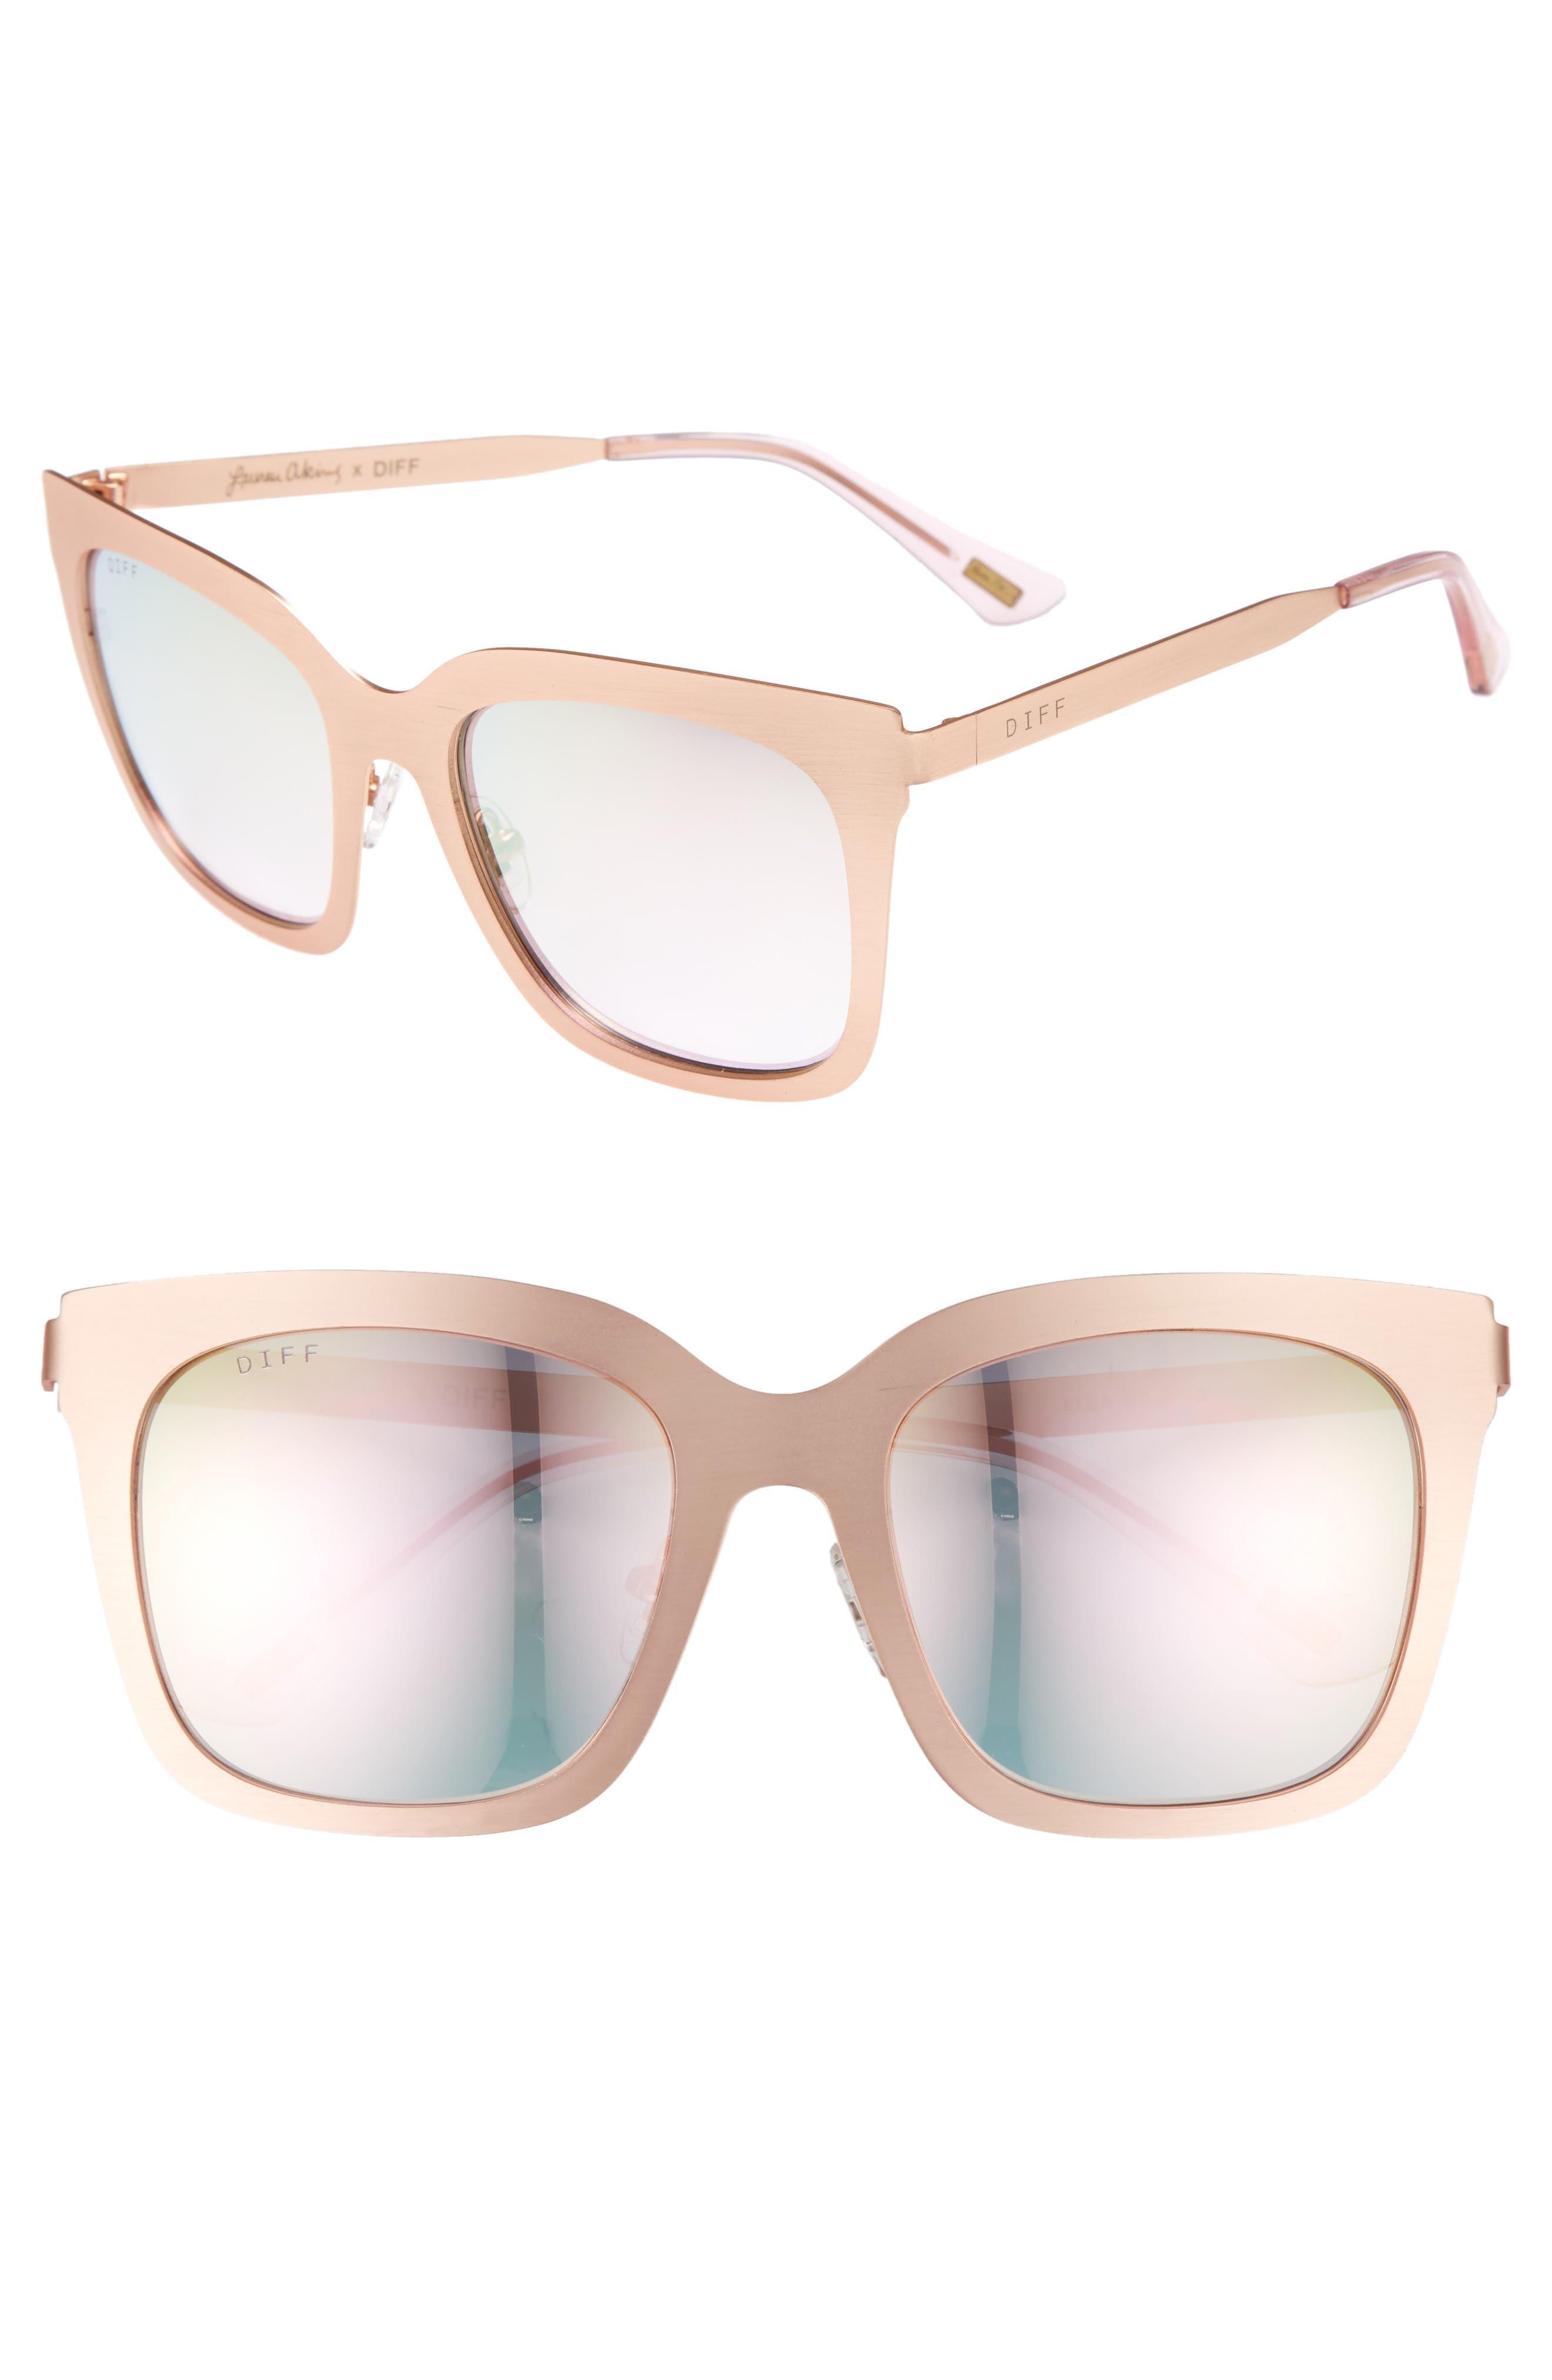 DIFF x Lauren Akins Ella 53mm Sunglasses